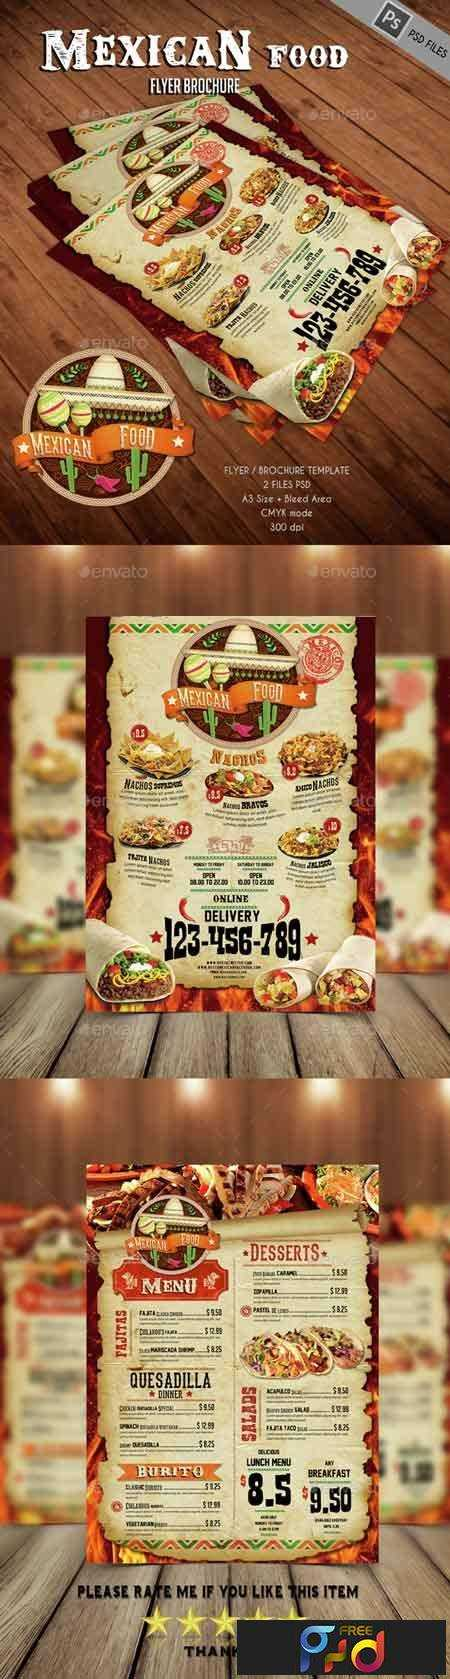 freepsdvn-com_1455231397_mexican-food-14675797